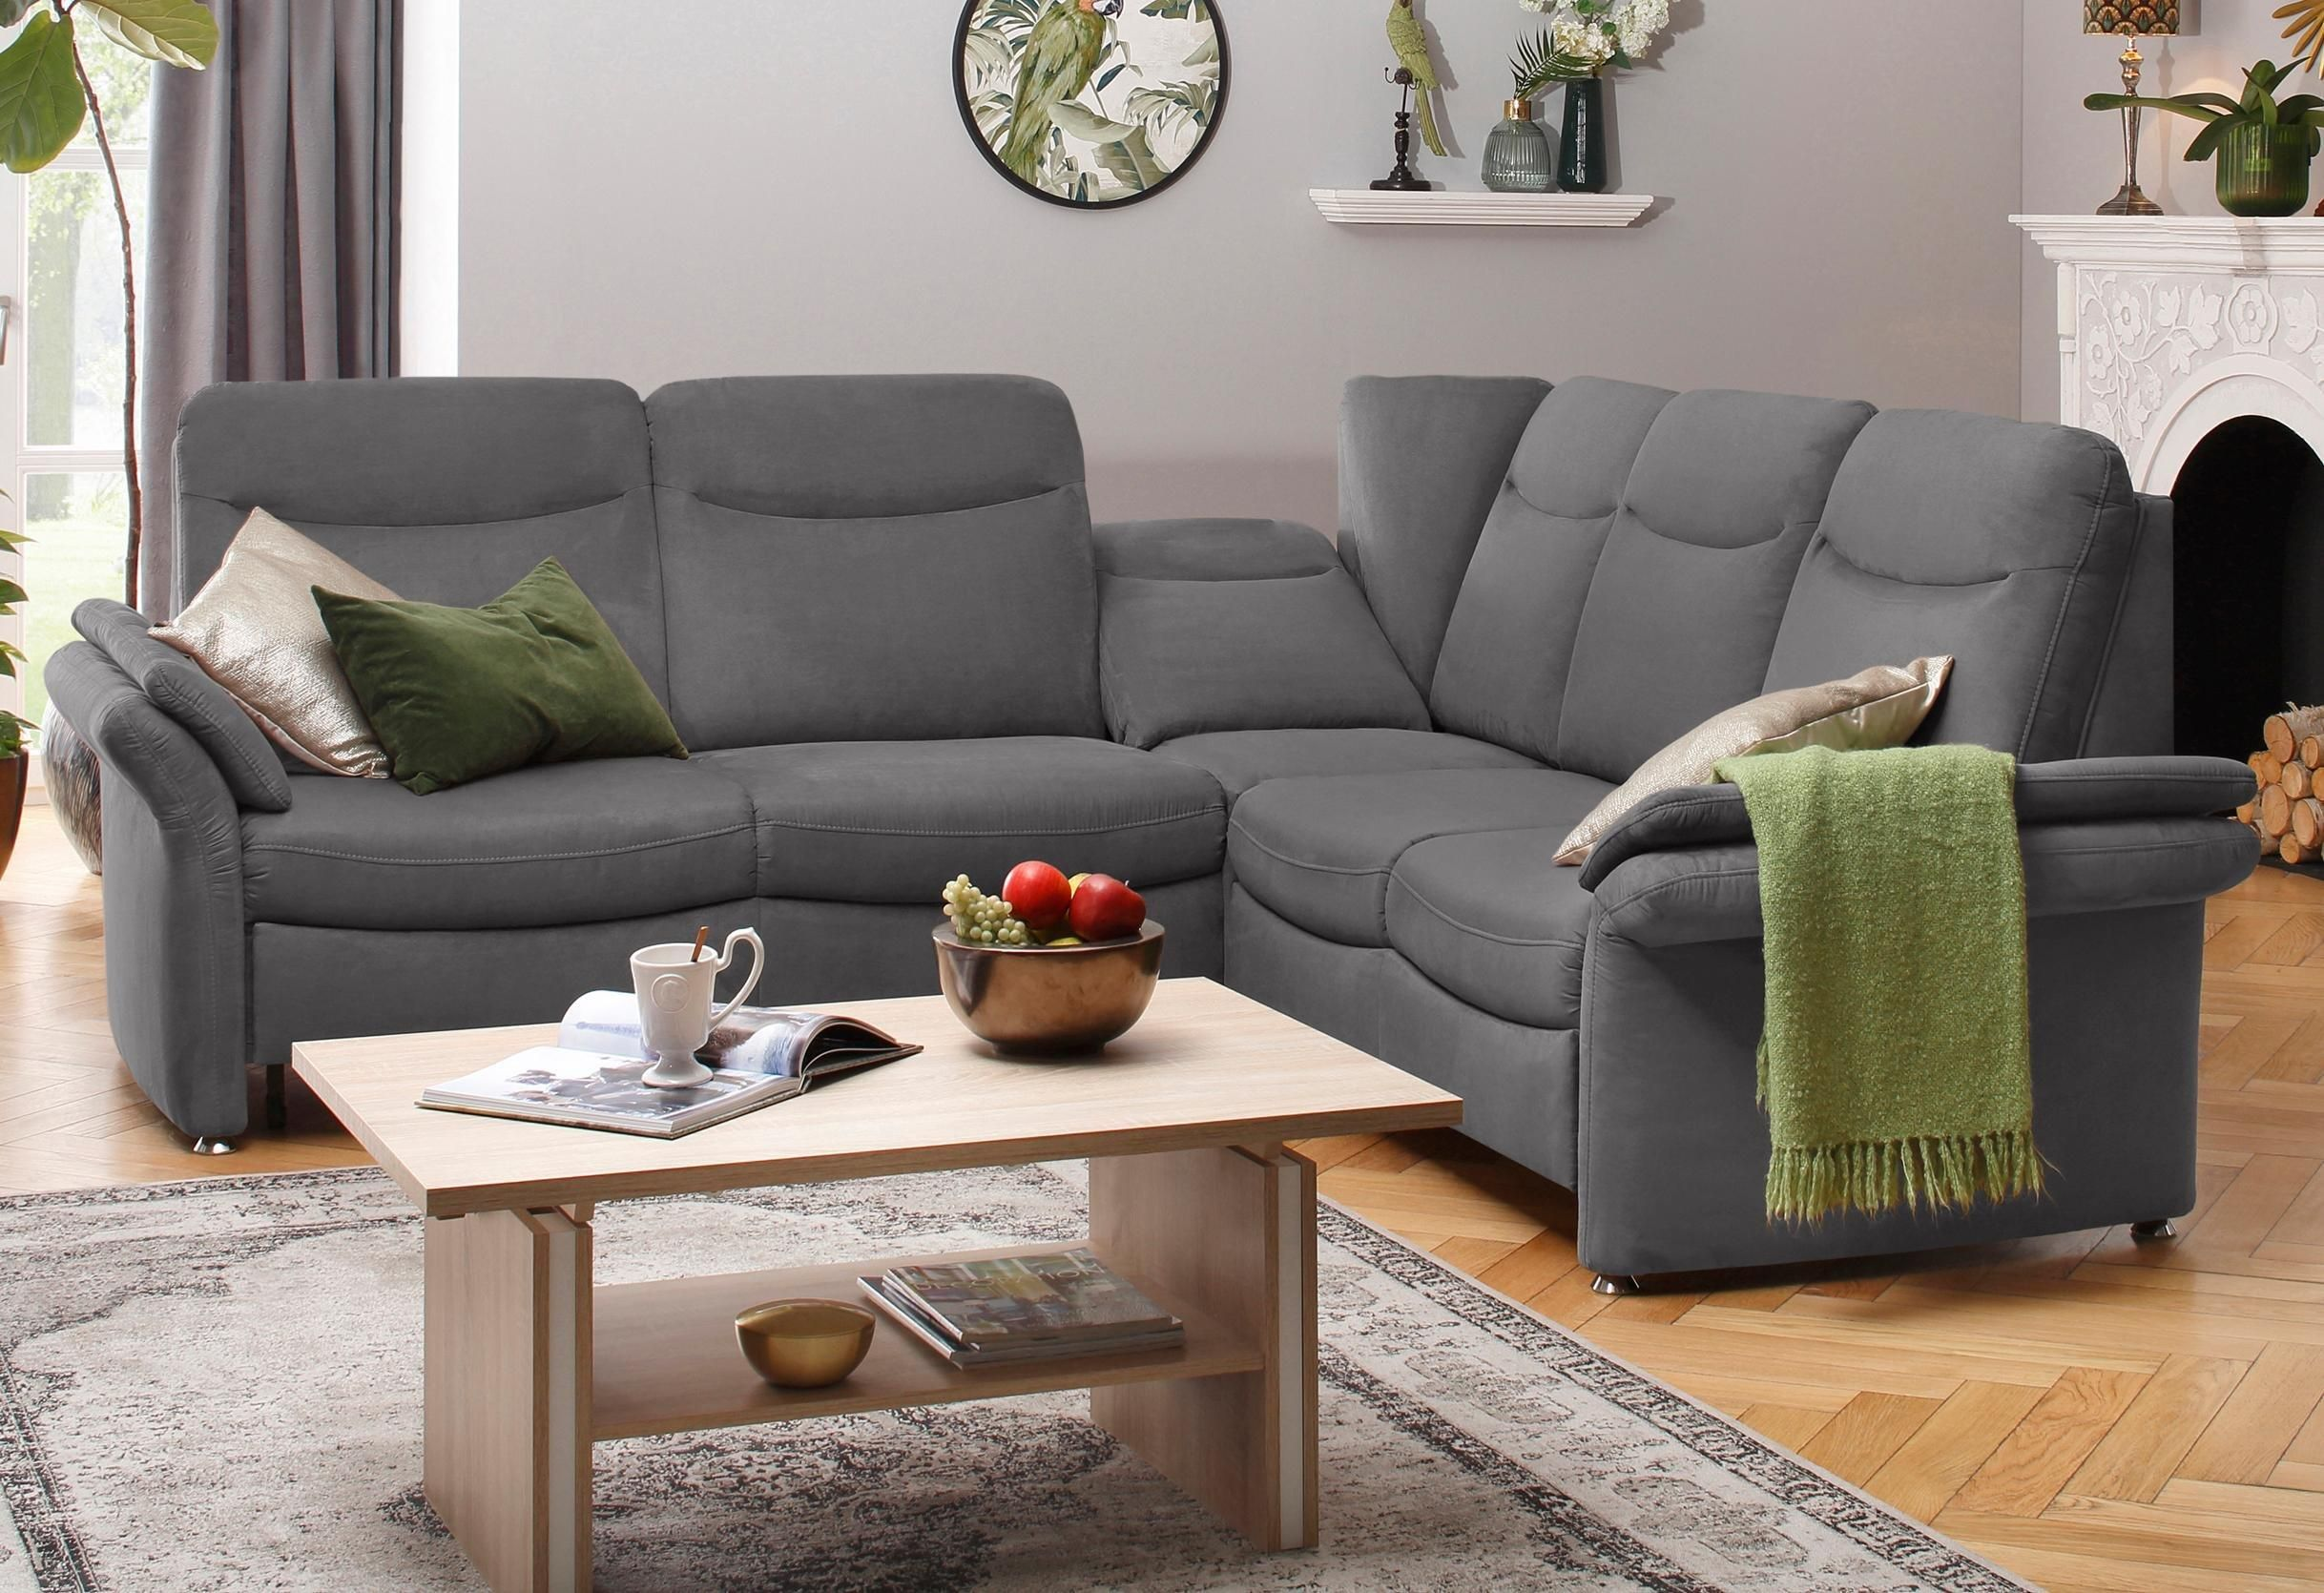 Full Size of Günstig Sofa Kaufen Leder Sofas Gnstig Best Online Furniture Store In Delhi 2er Kolonialstil Englisch Federkern Mit Bettfunktion Elektrischer Sofa Günstig Sofa Kaufen